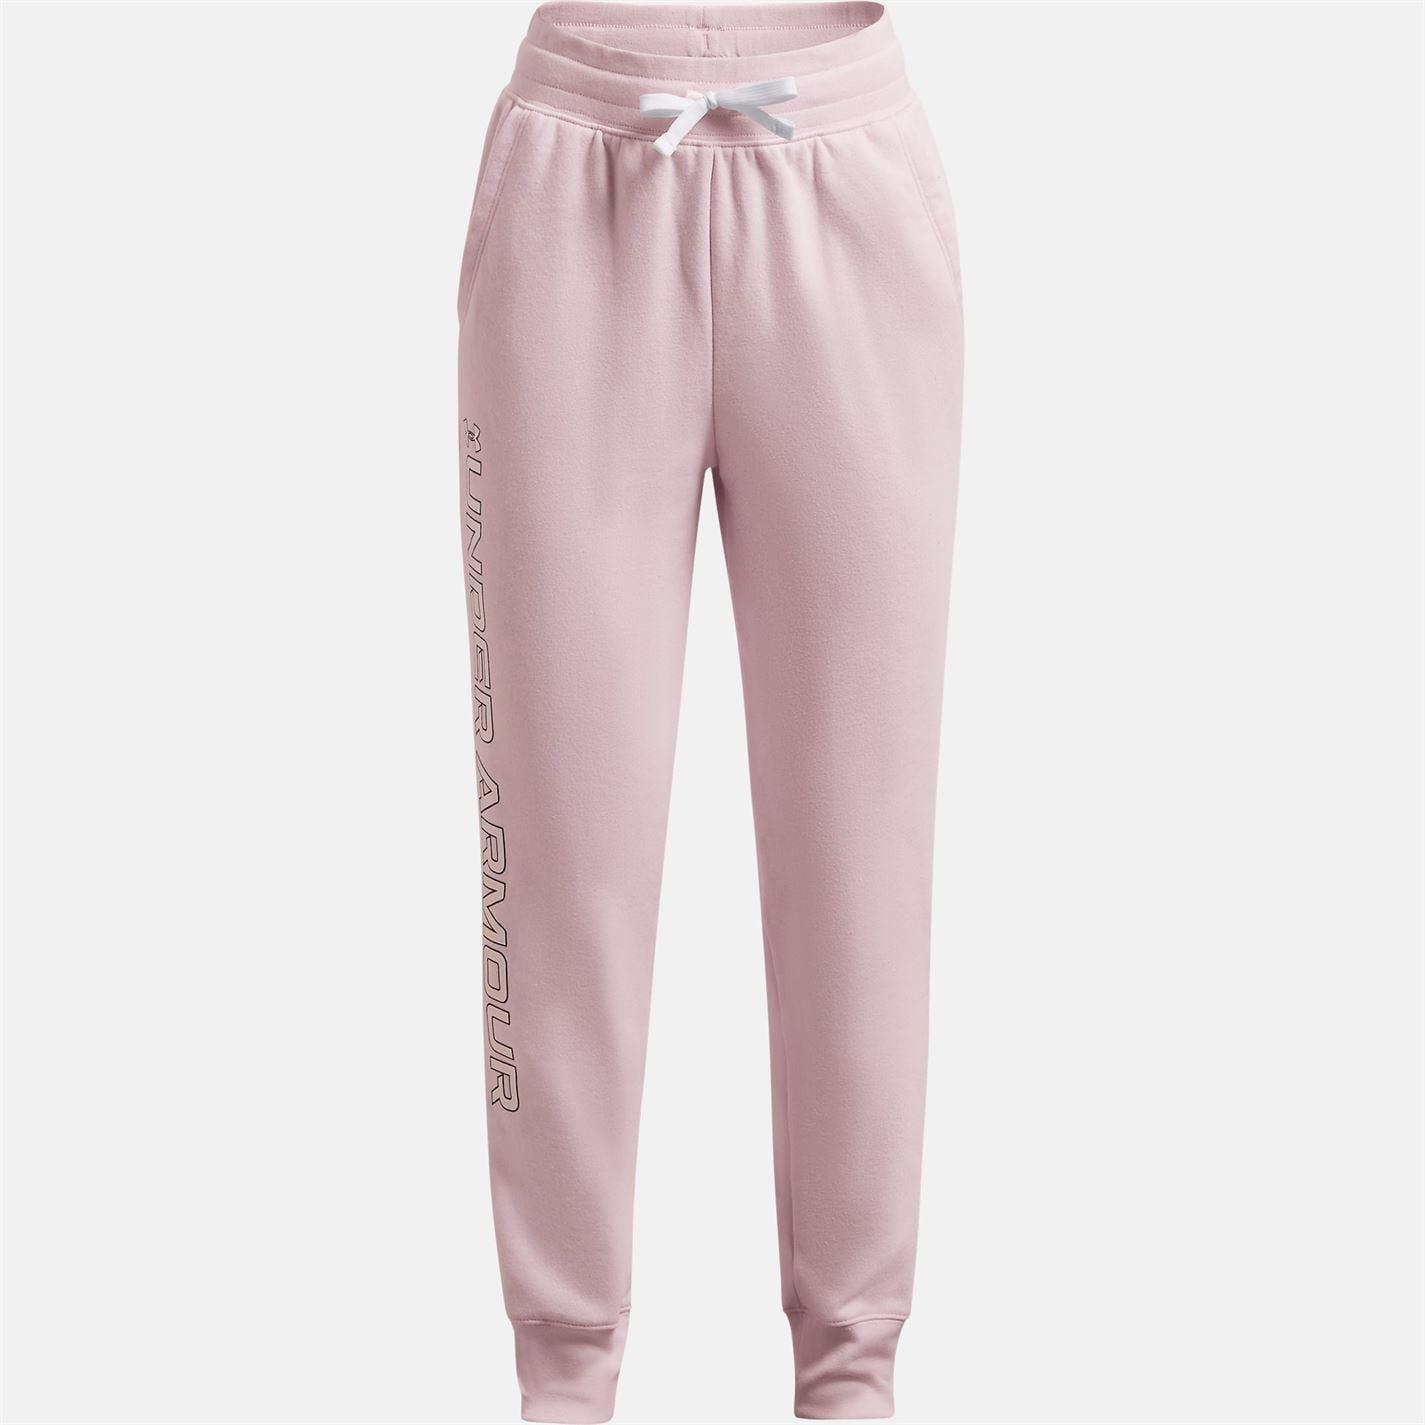 Pantaloni jogging Under Armour cool roz